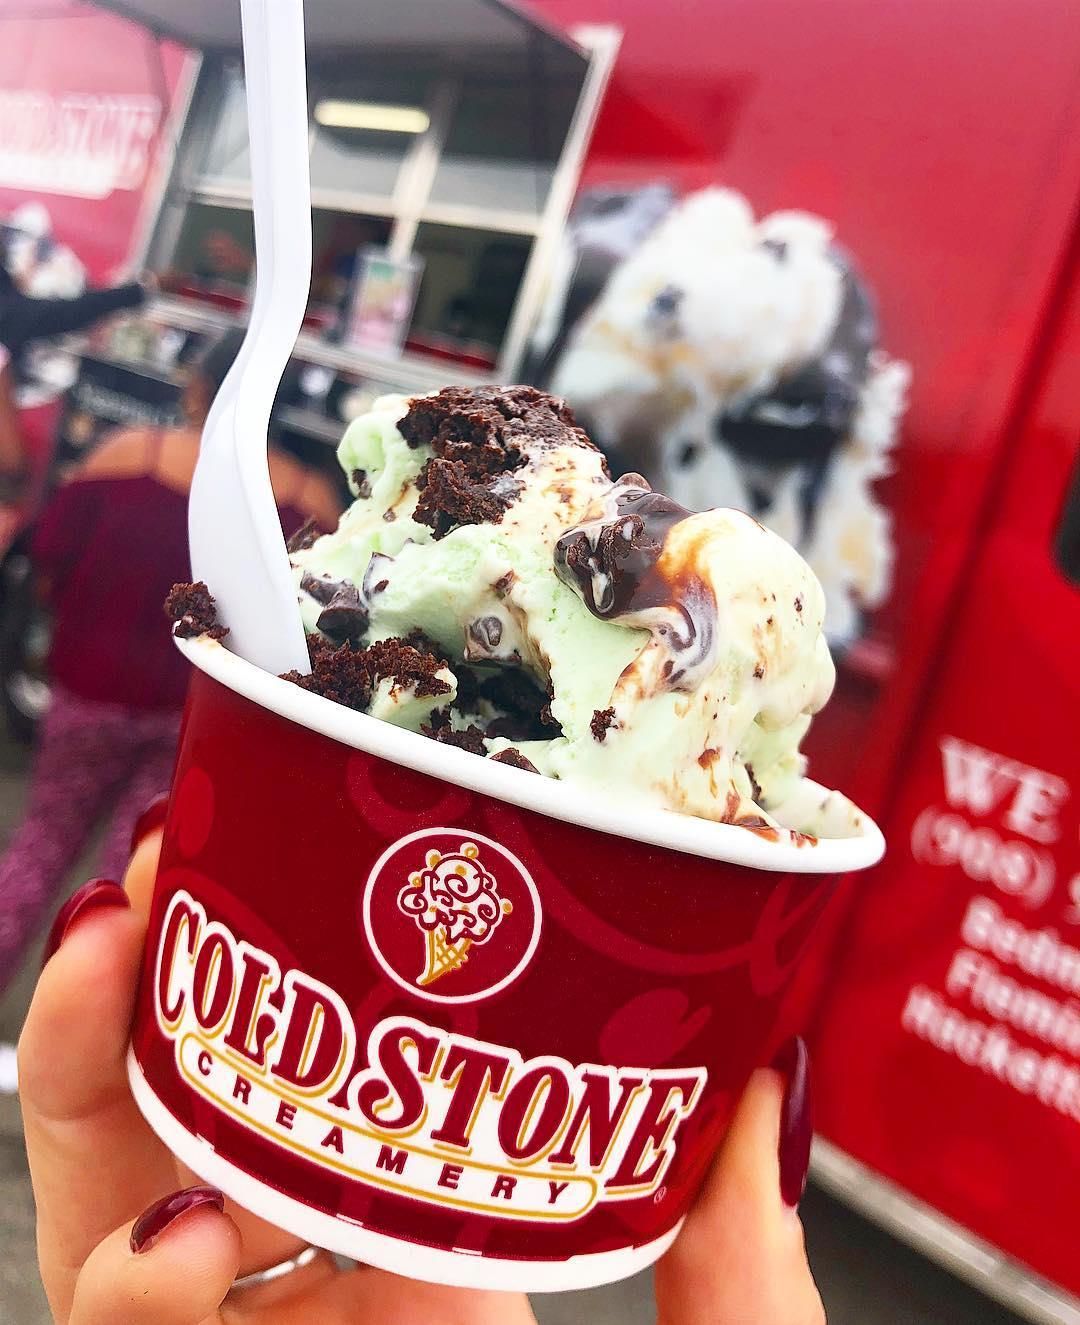 Mint Chocolate Chip Ice Cream Cold Stone Creamery Food Truck